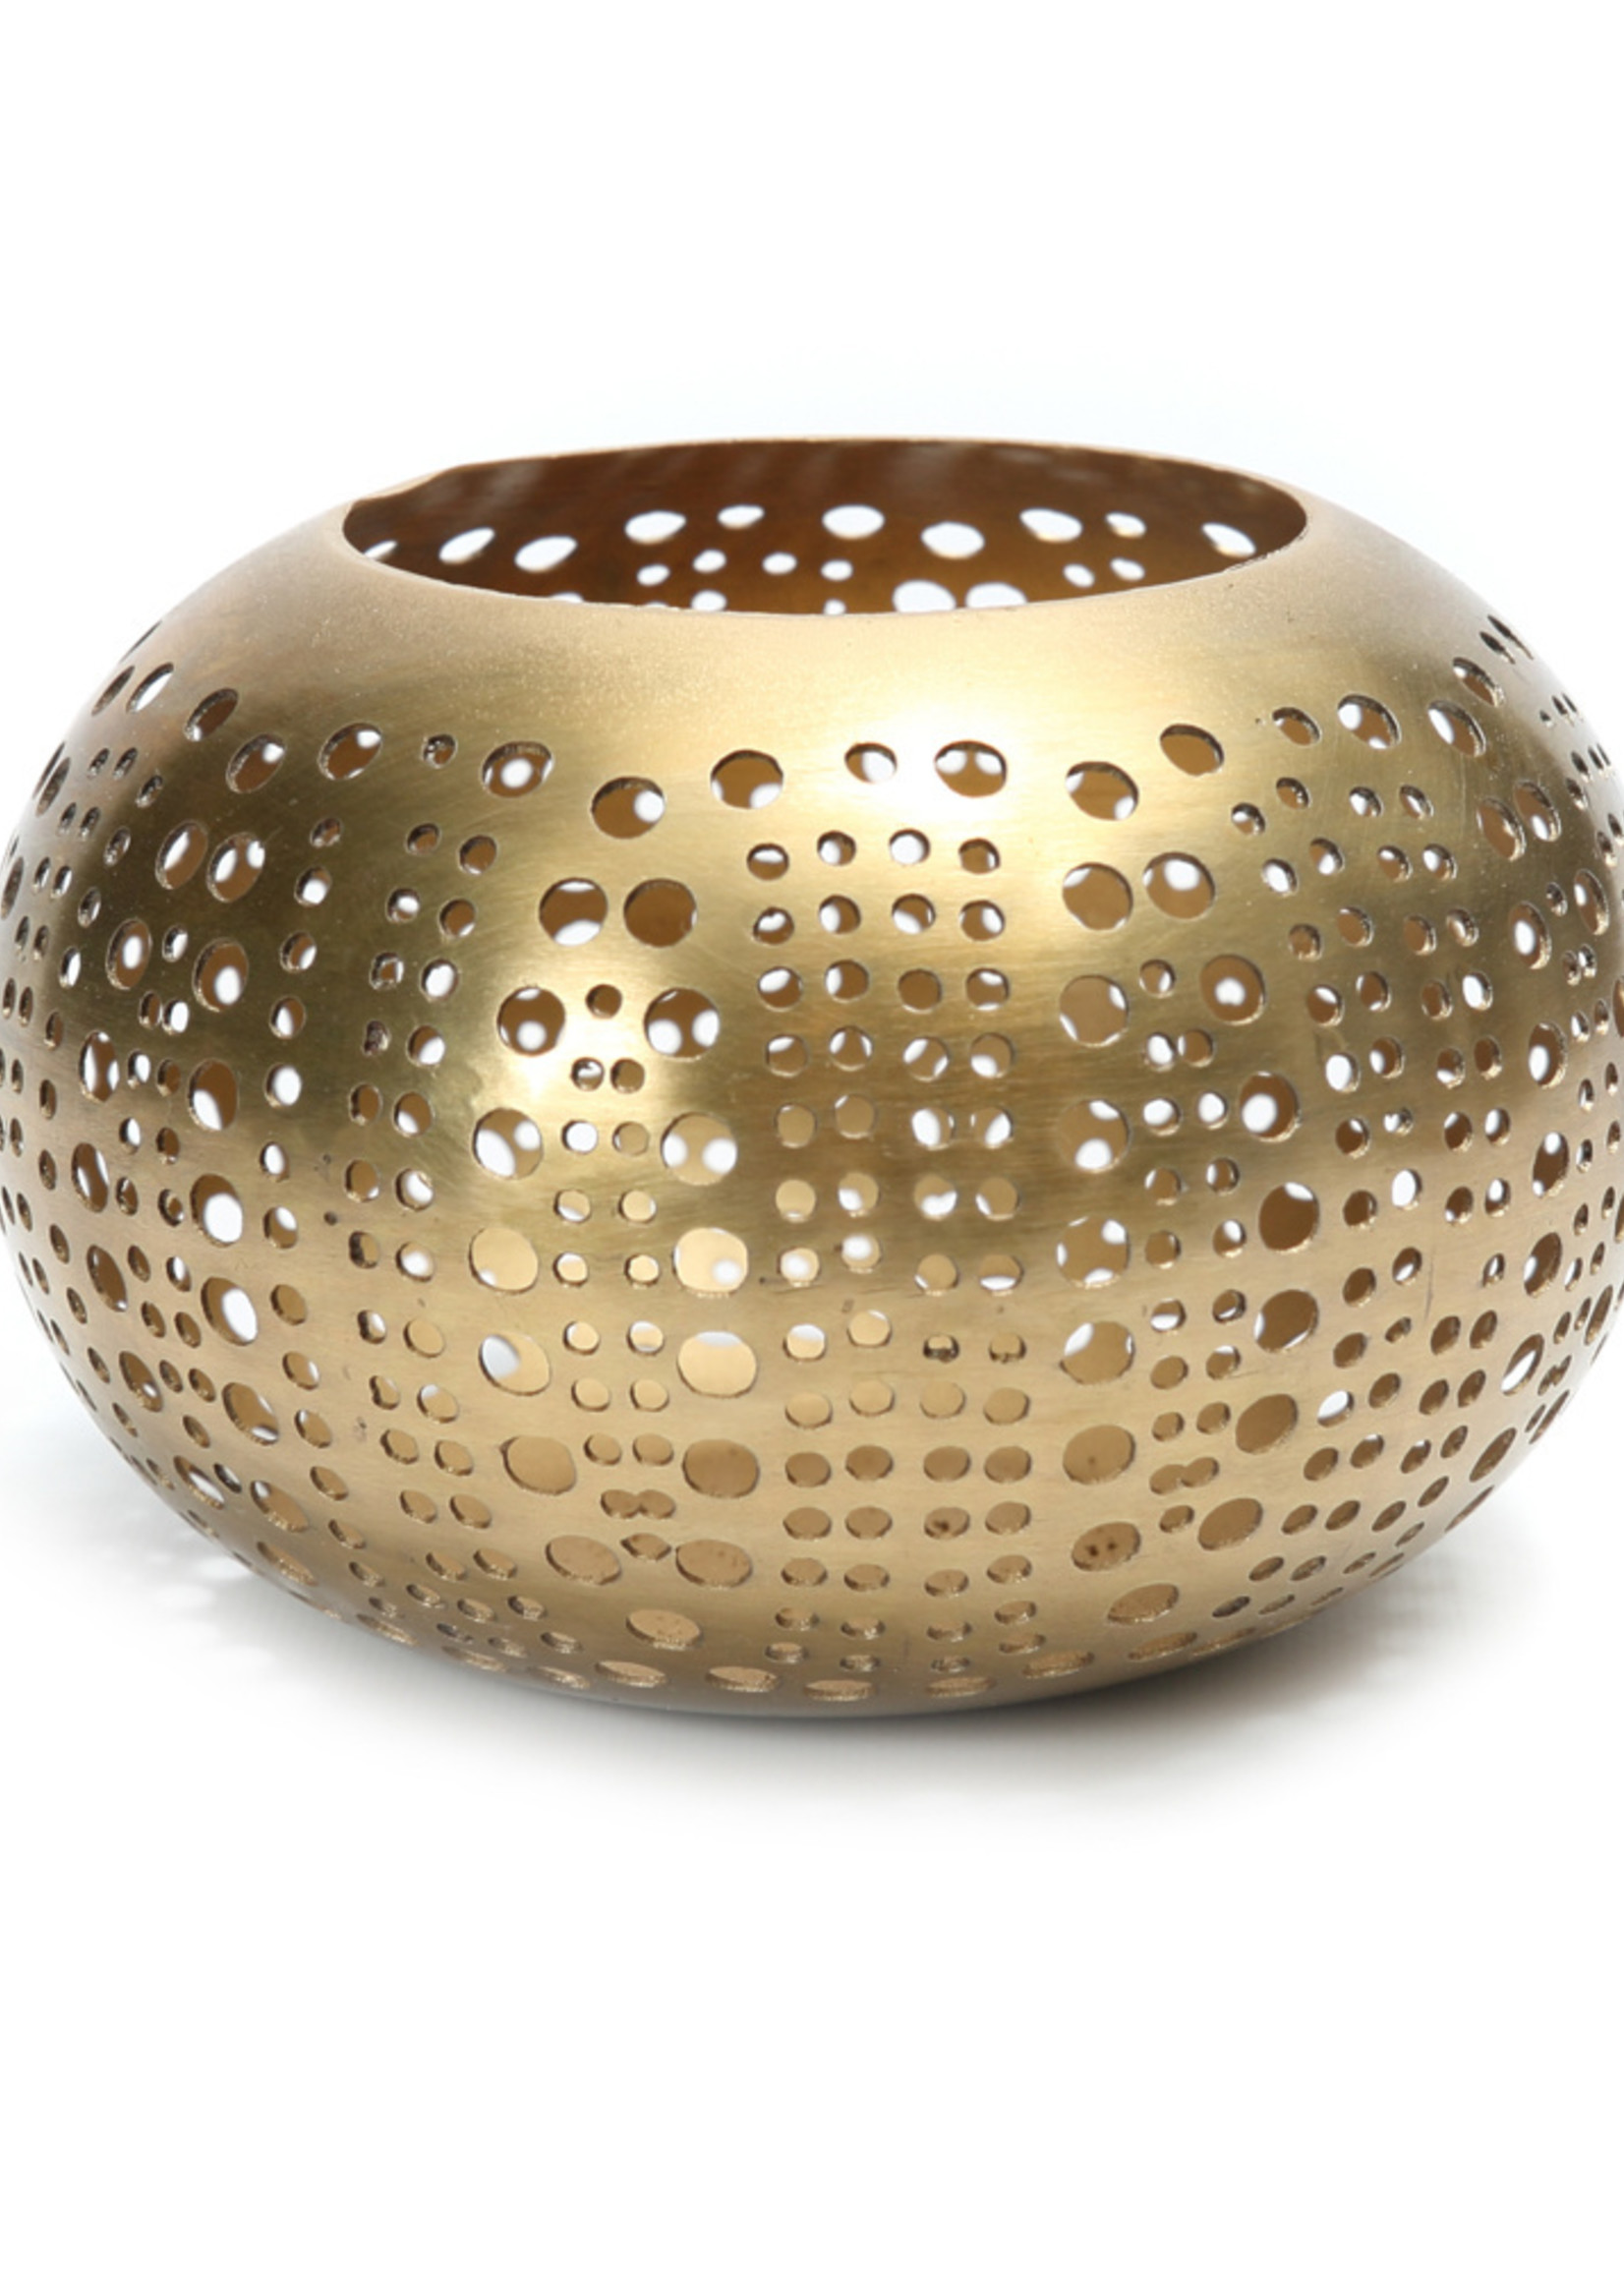 The Polka Dots - Gold - M